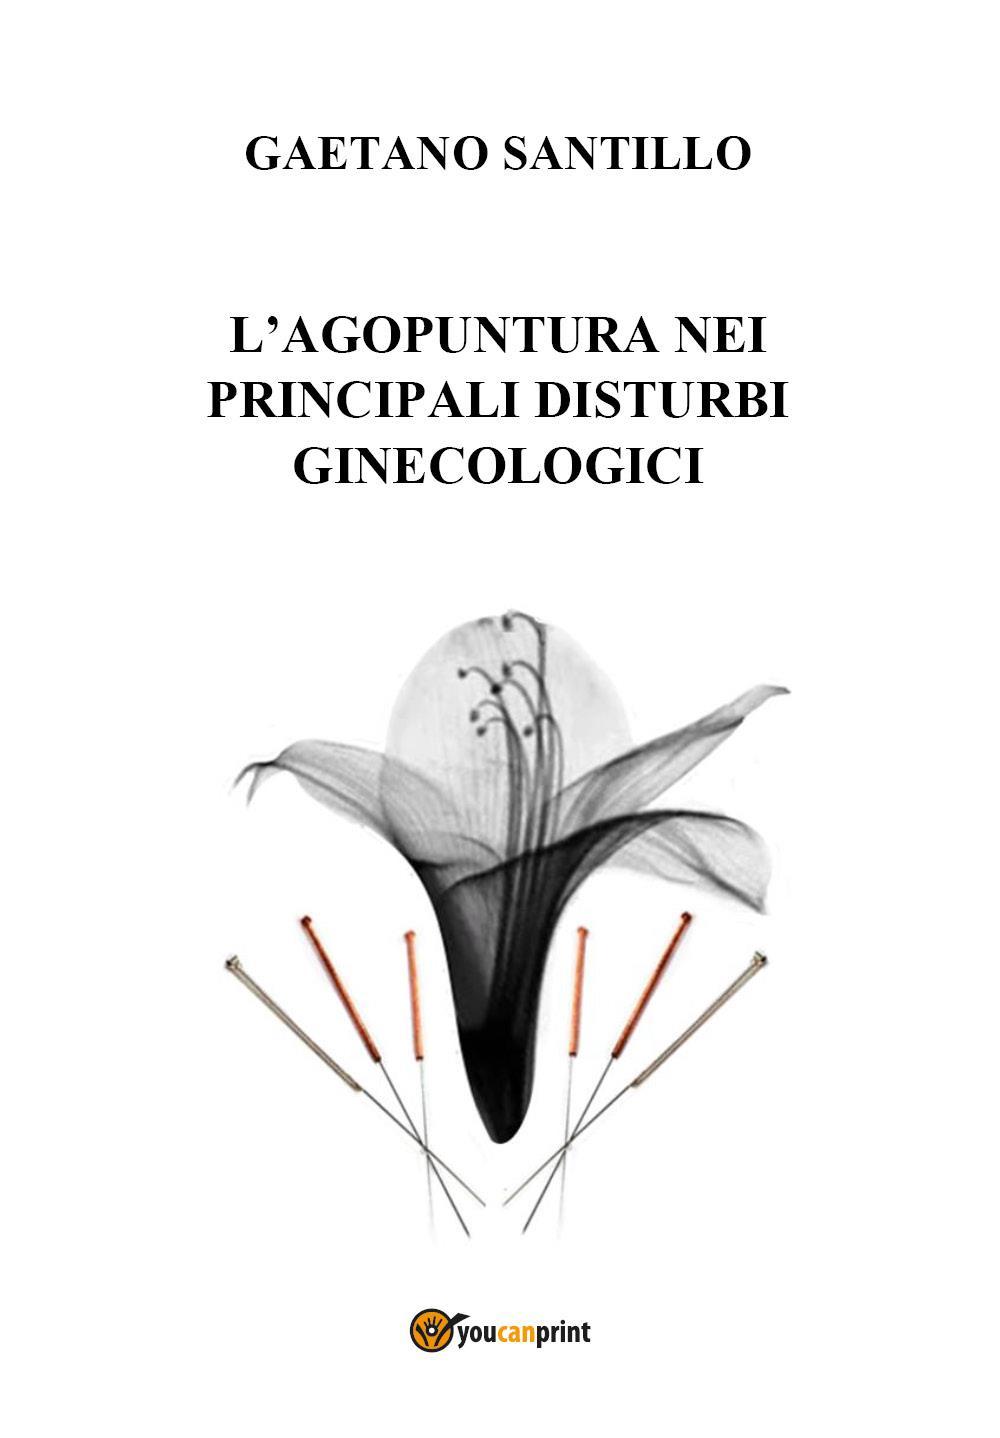 L'agopuntura nei principali disturbi ginecologici